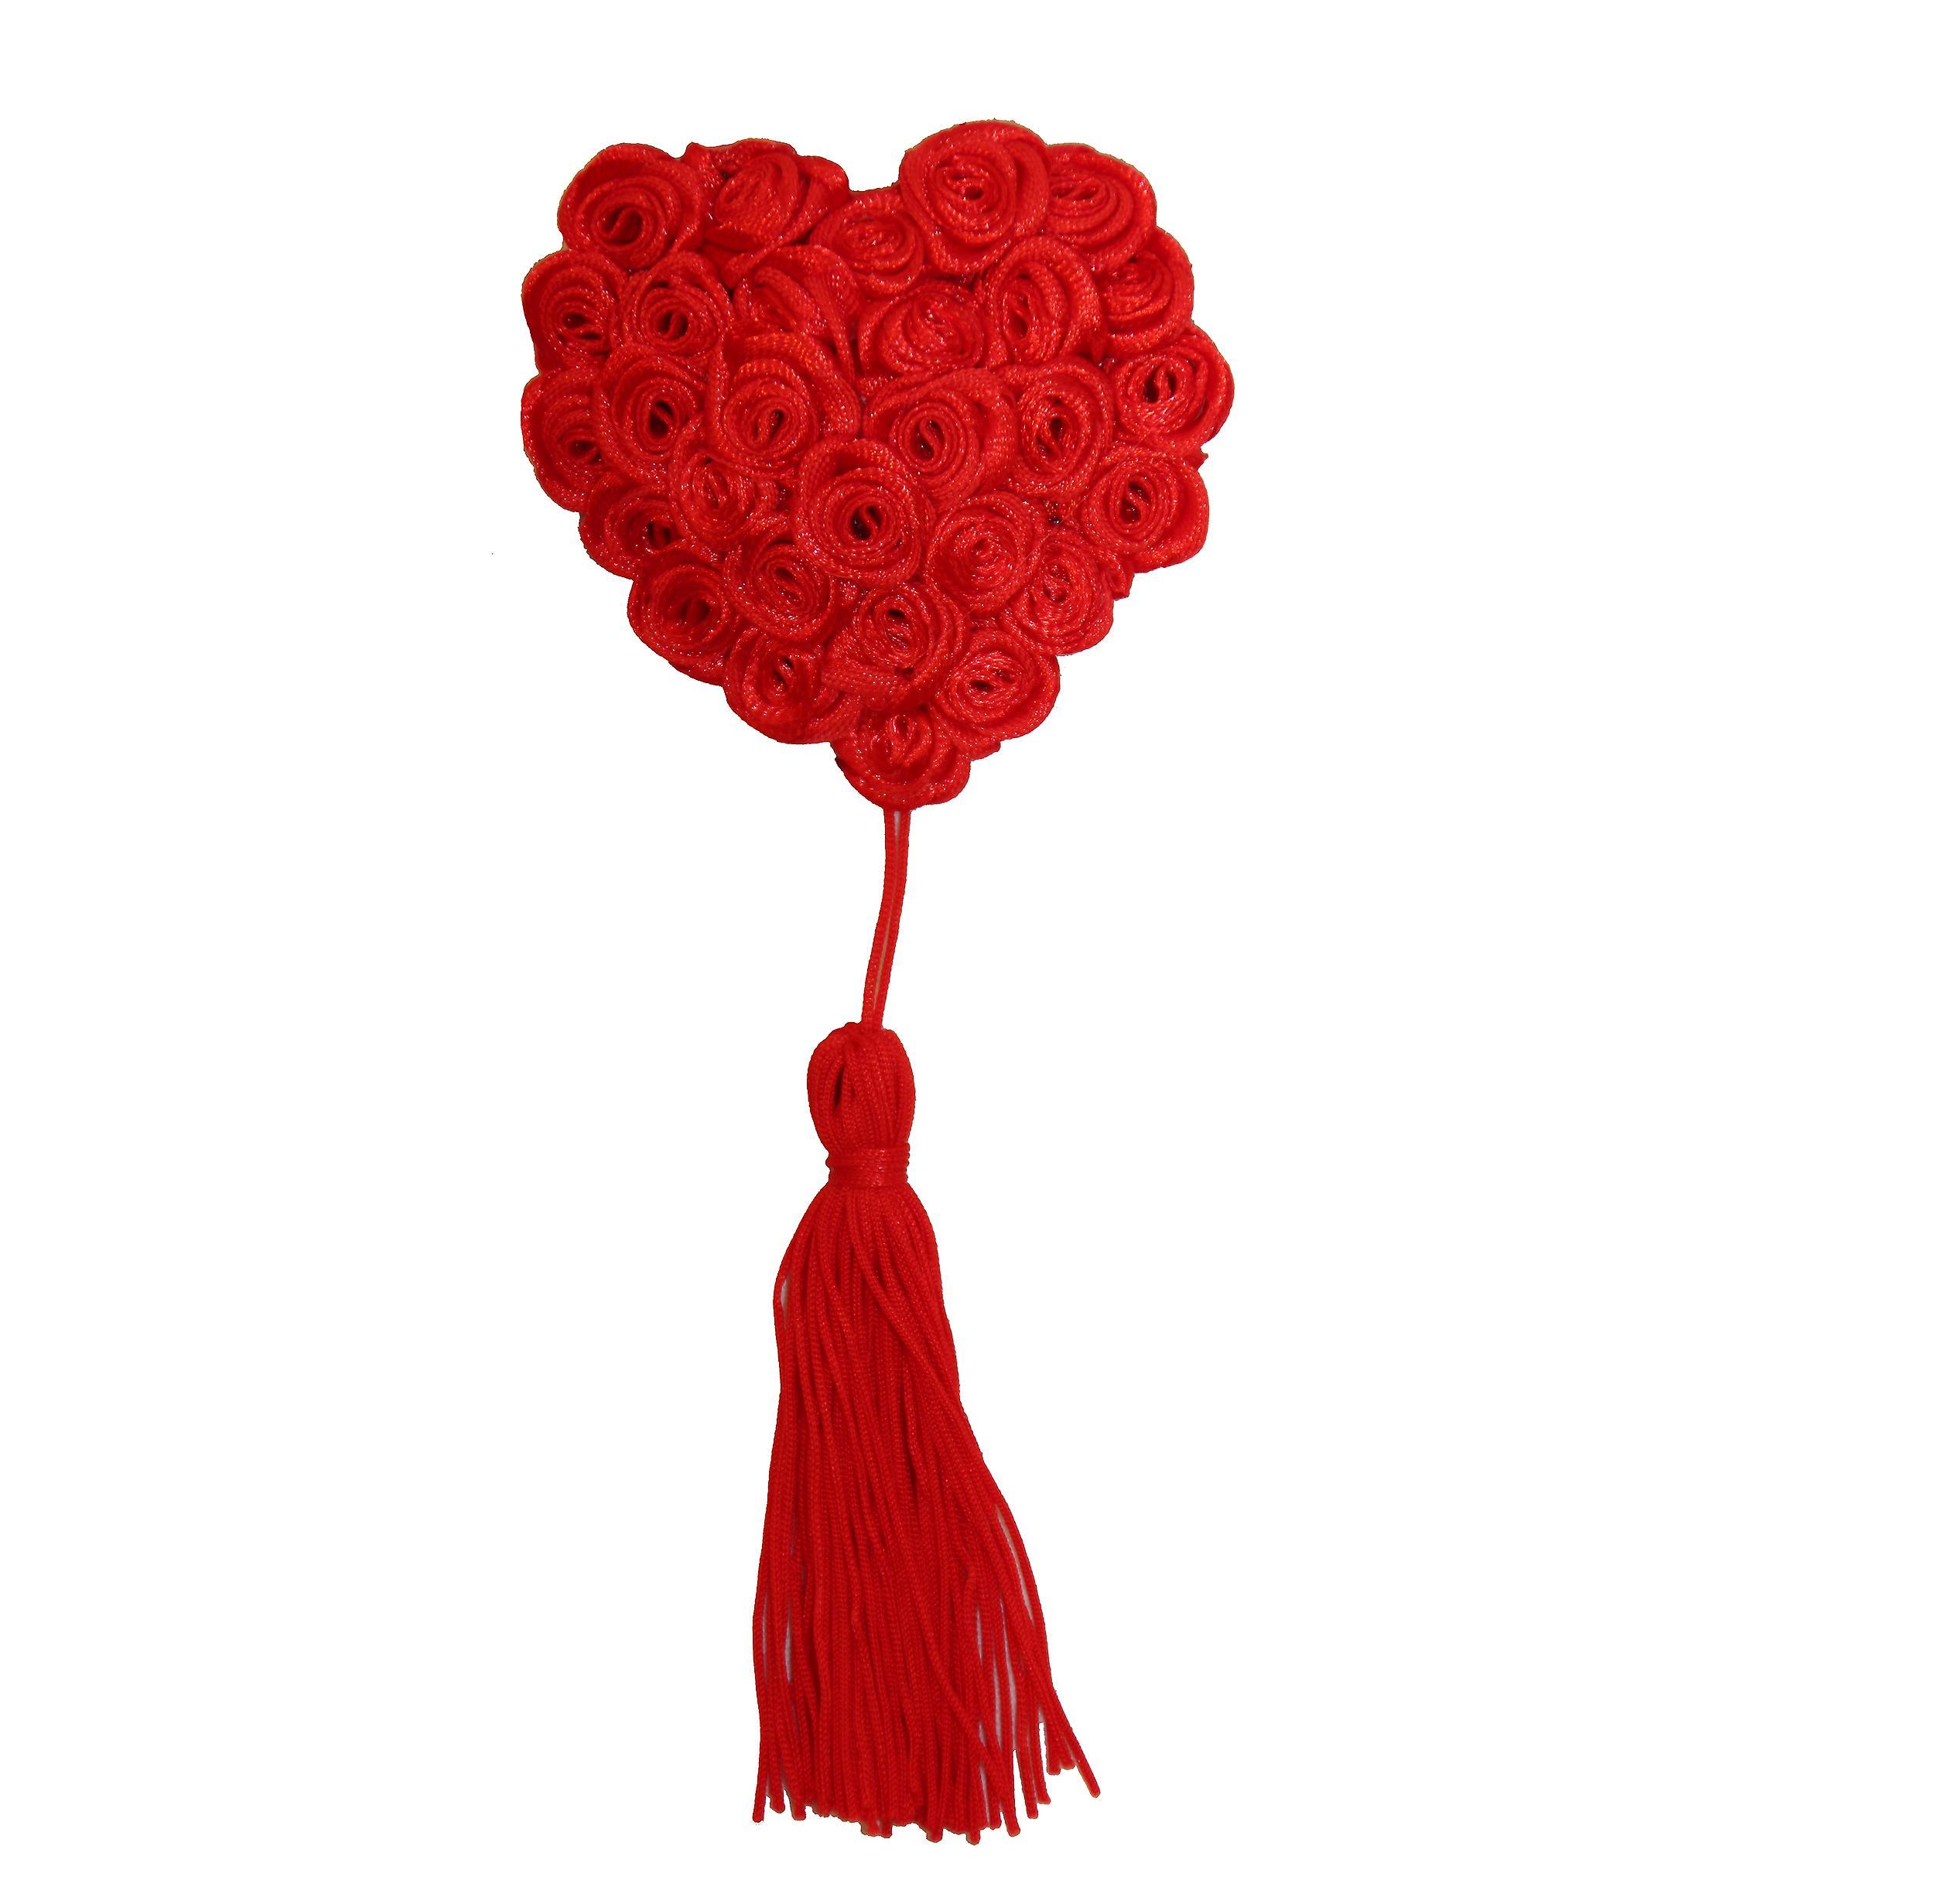 Waooh 69 - Cache-Teton hart Red Roses